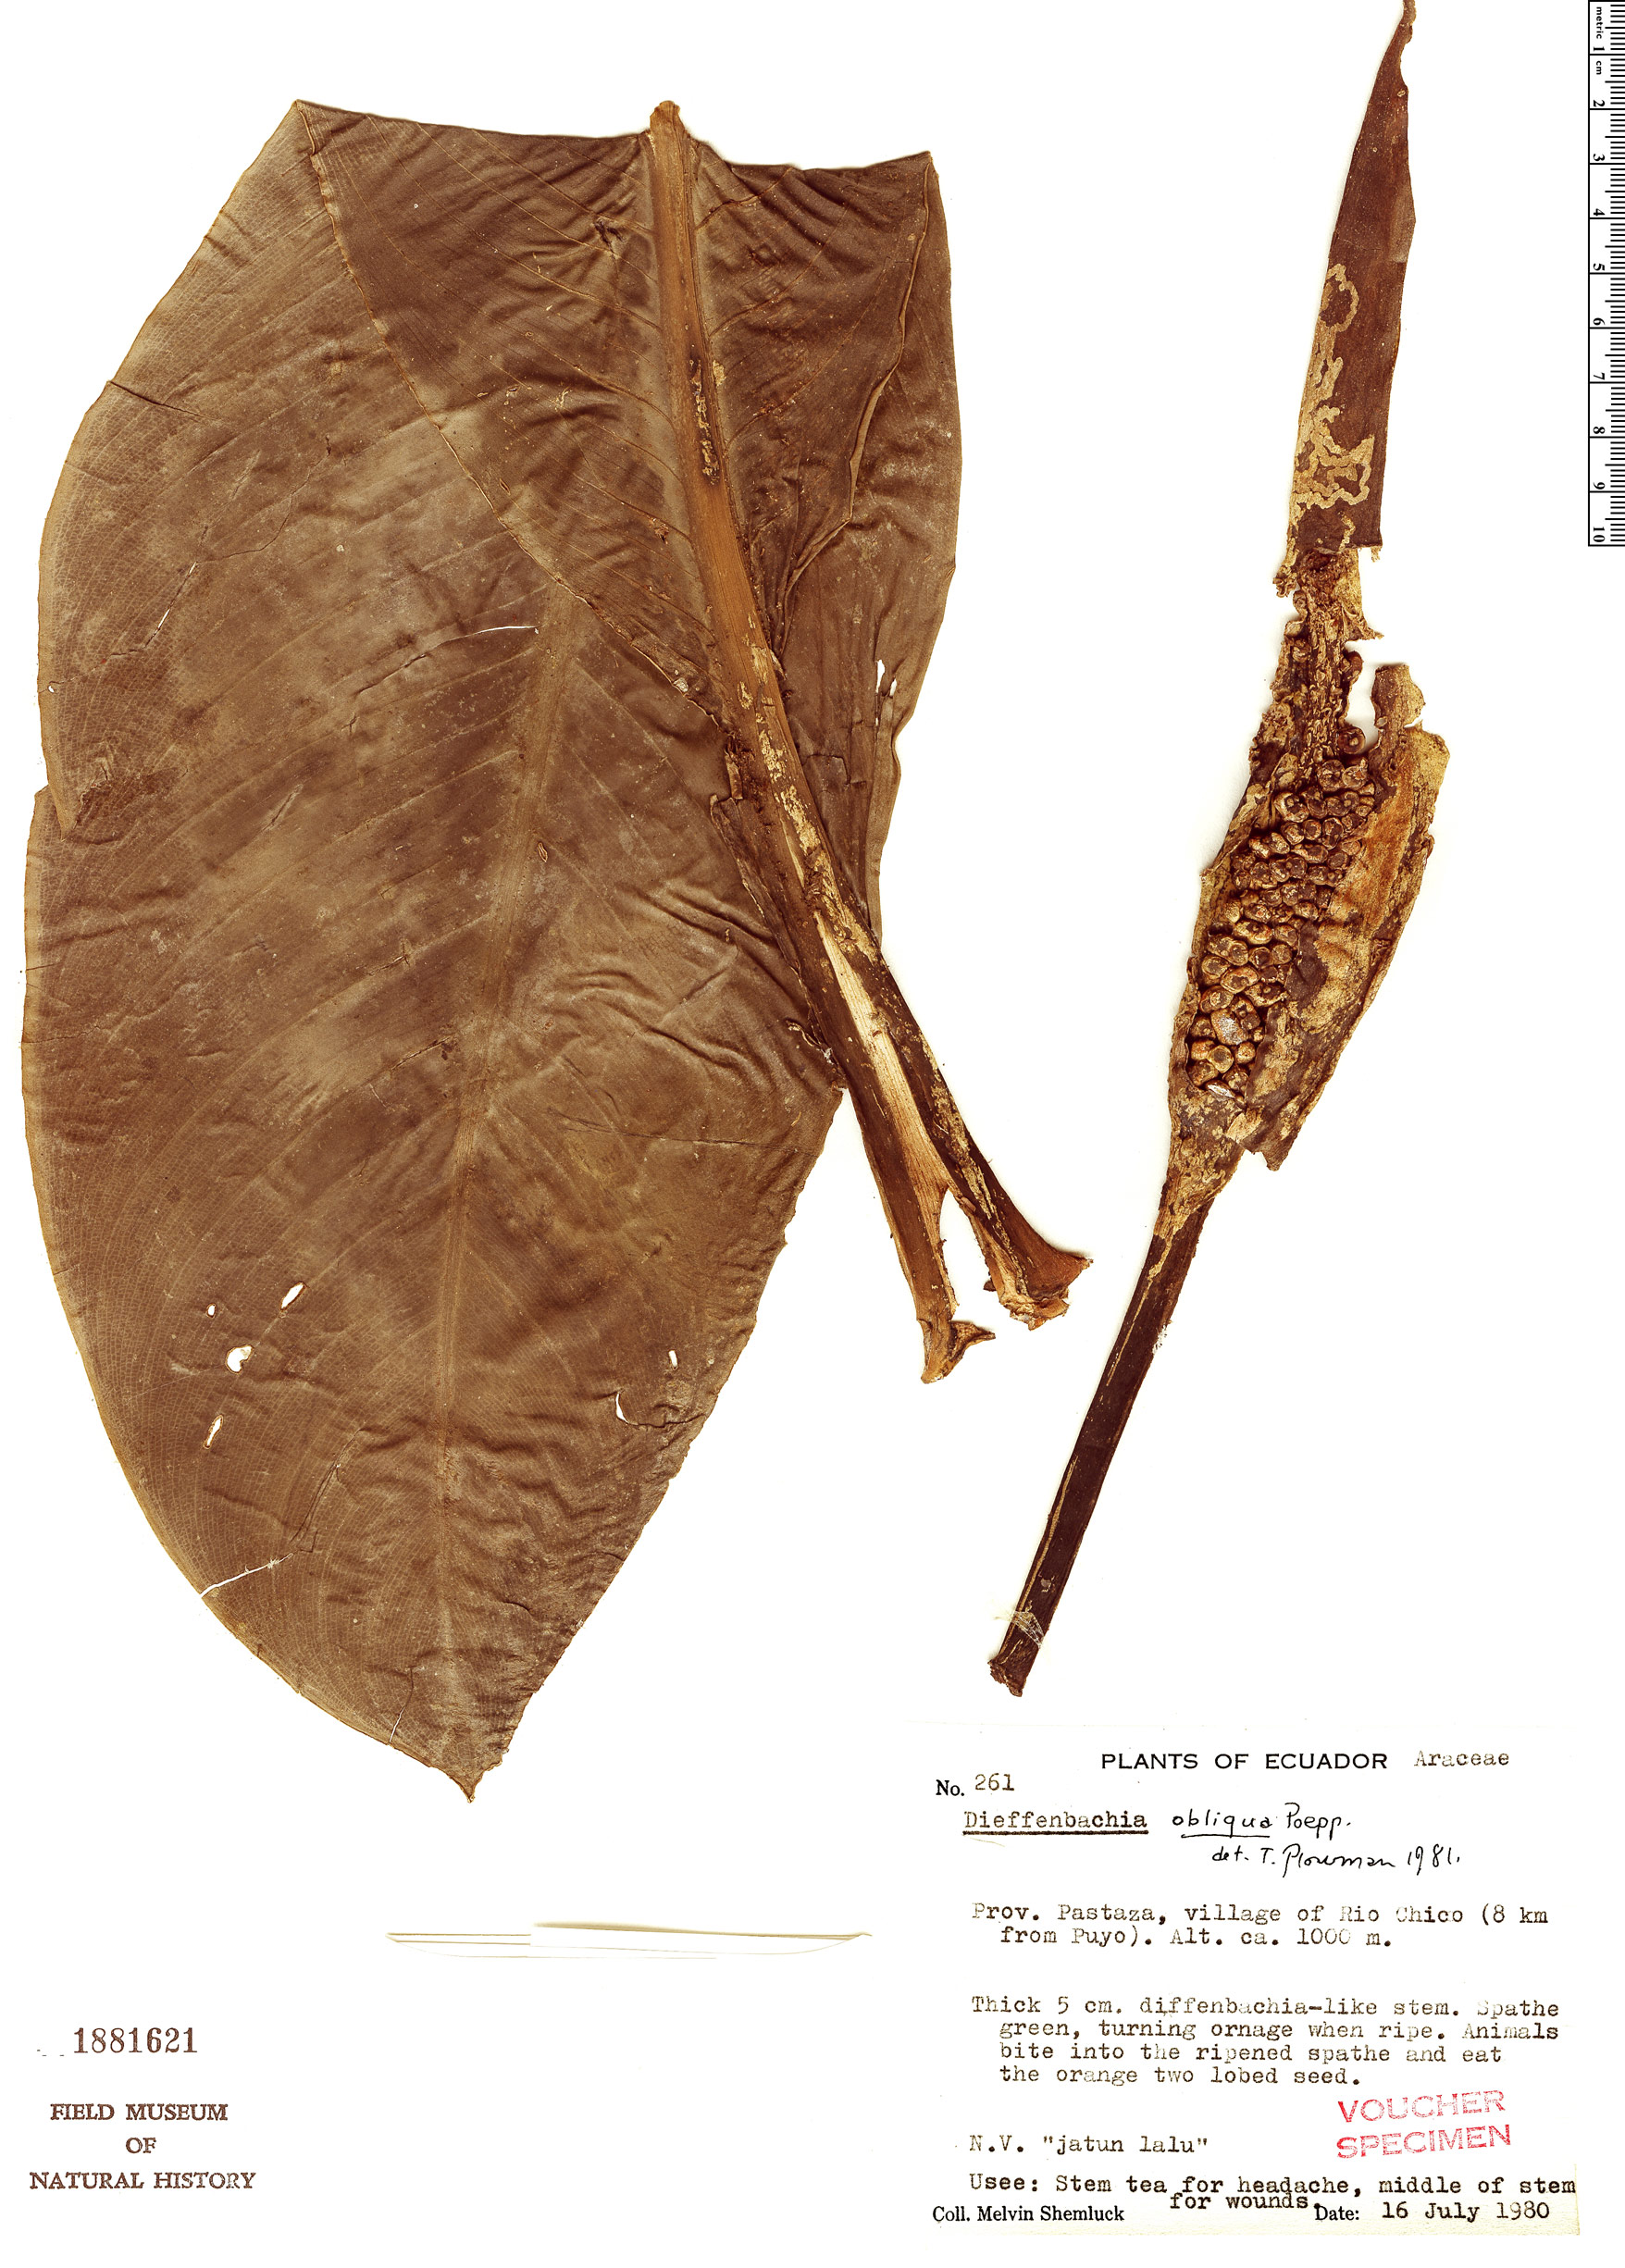 Specimen: Dieffenbachia obliqua